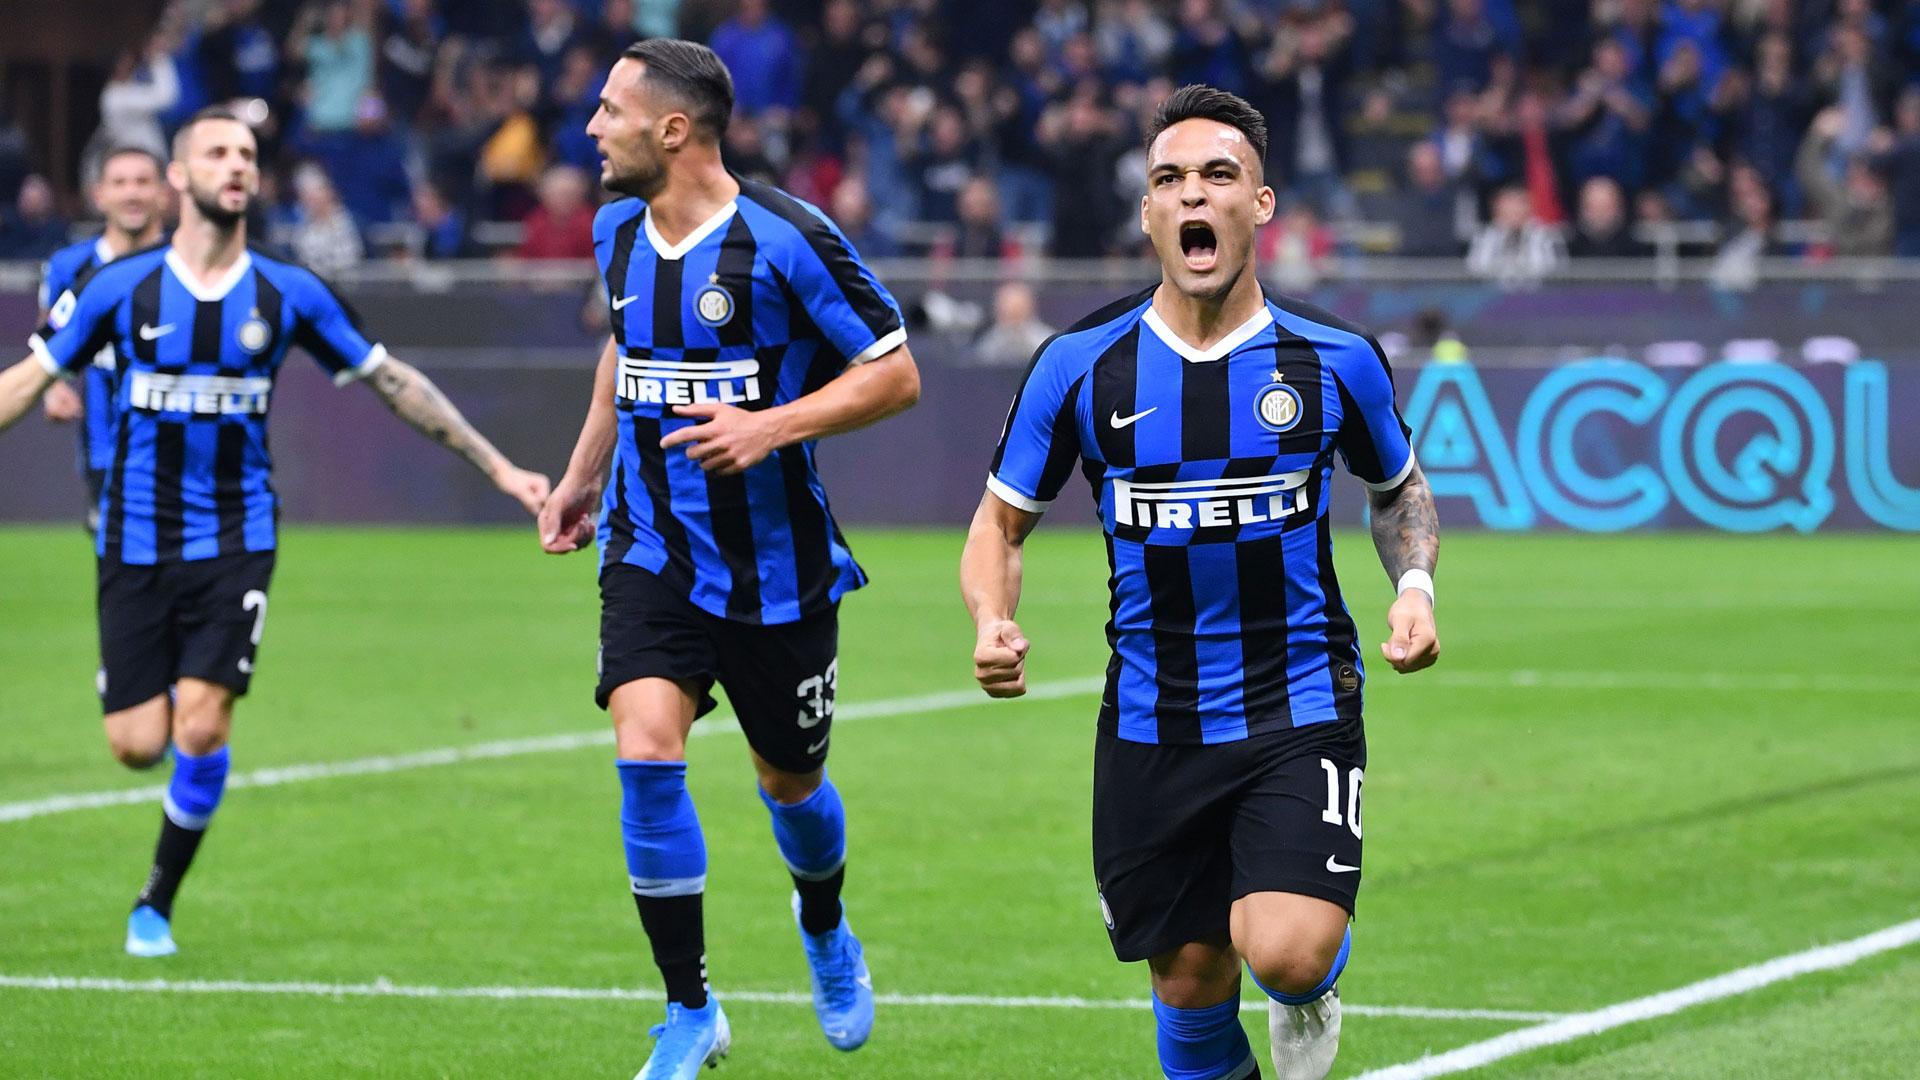 Calcio: fuoriprogramma Sassuolo-Inter,paracadutista in campo